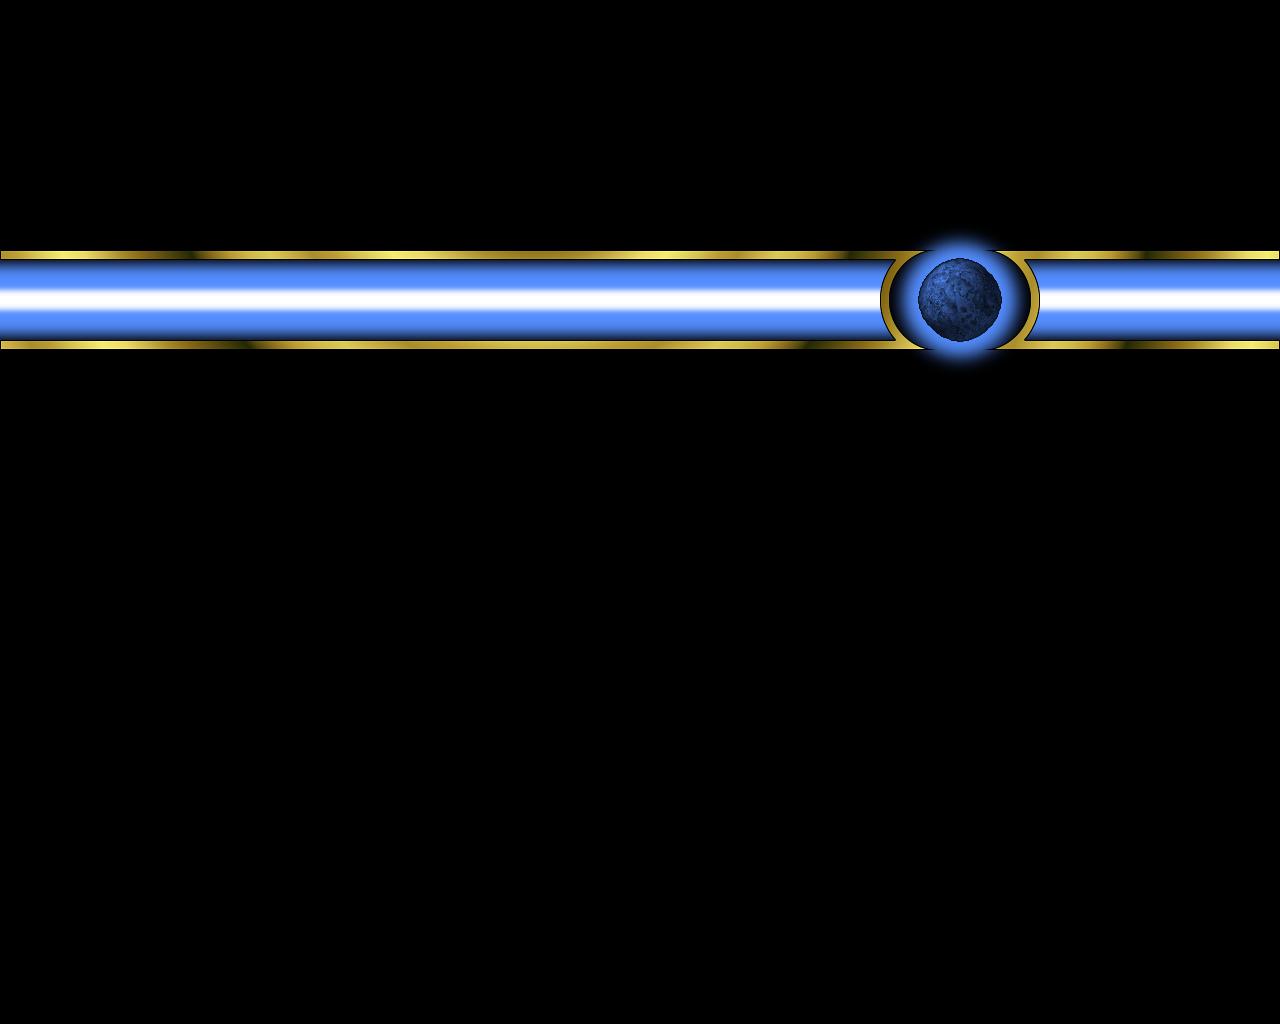 Glowing Planet Wallpaper Pack by SocratesJedi